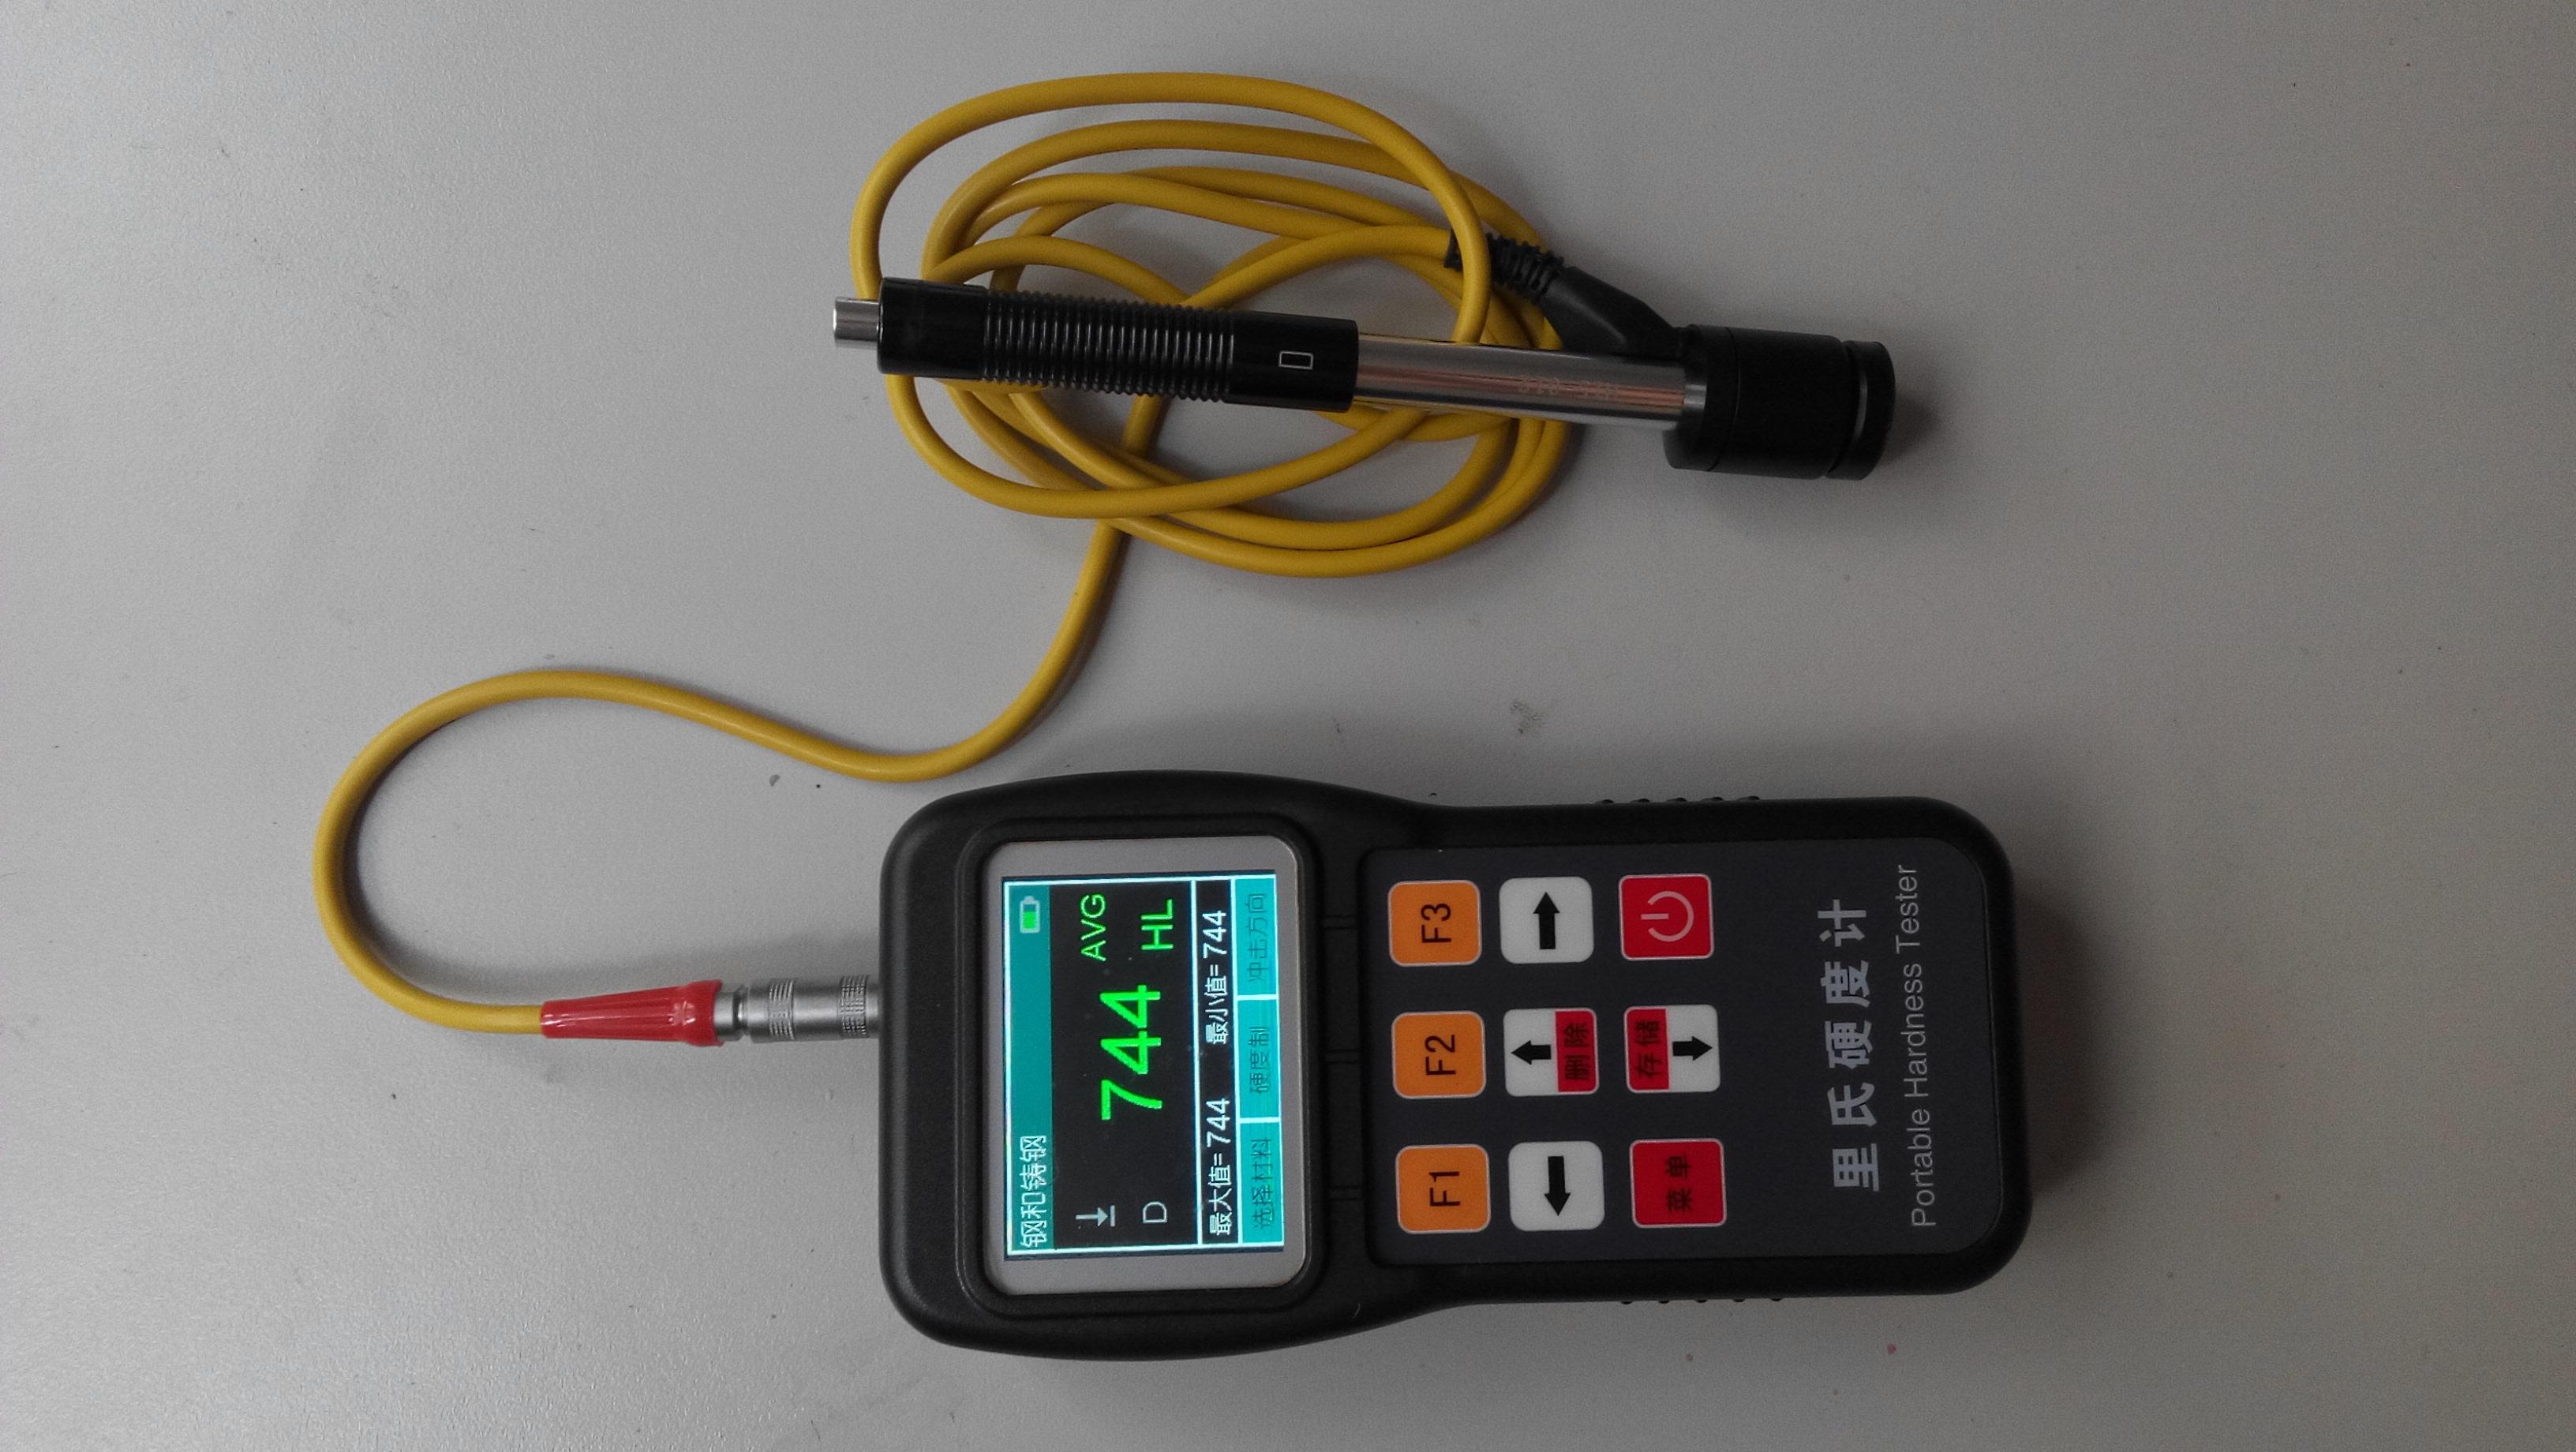 GHT500 Leeb hardness tester